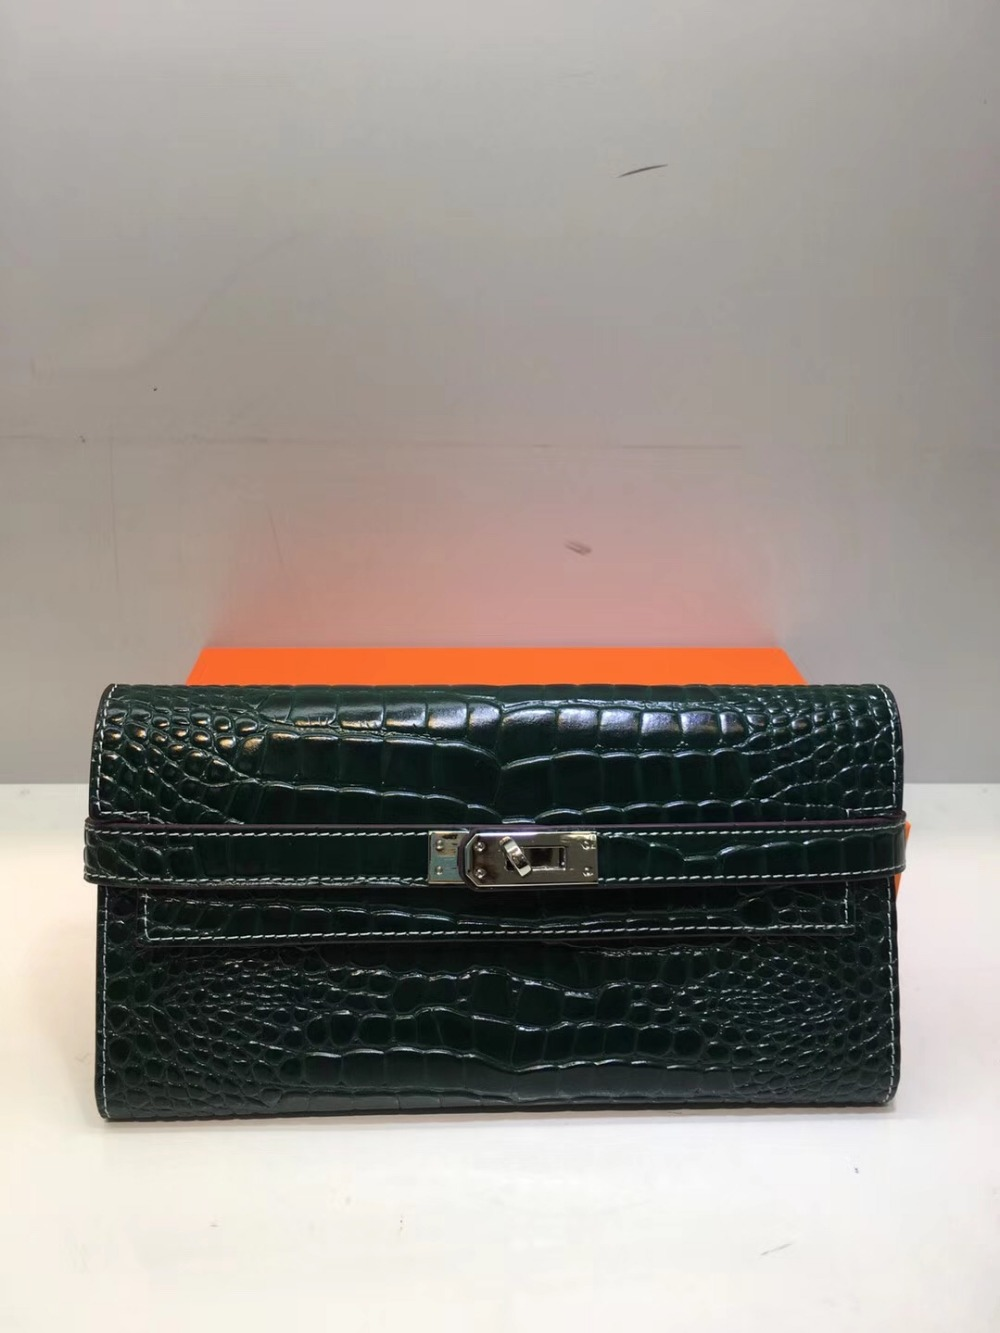 Cafunila marque de luxe portefeuille femmes en cuir véritable designer femmes sac à main original en cuir motif crocodile mode embrayage bolsa